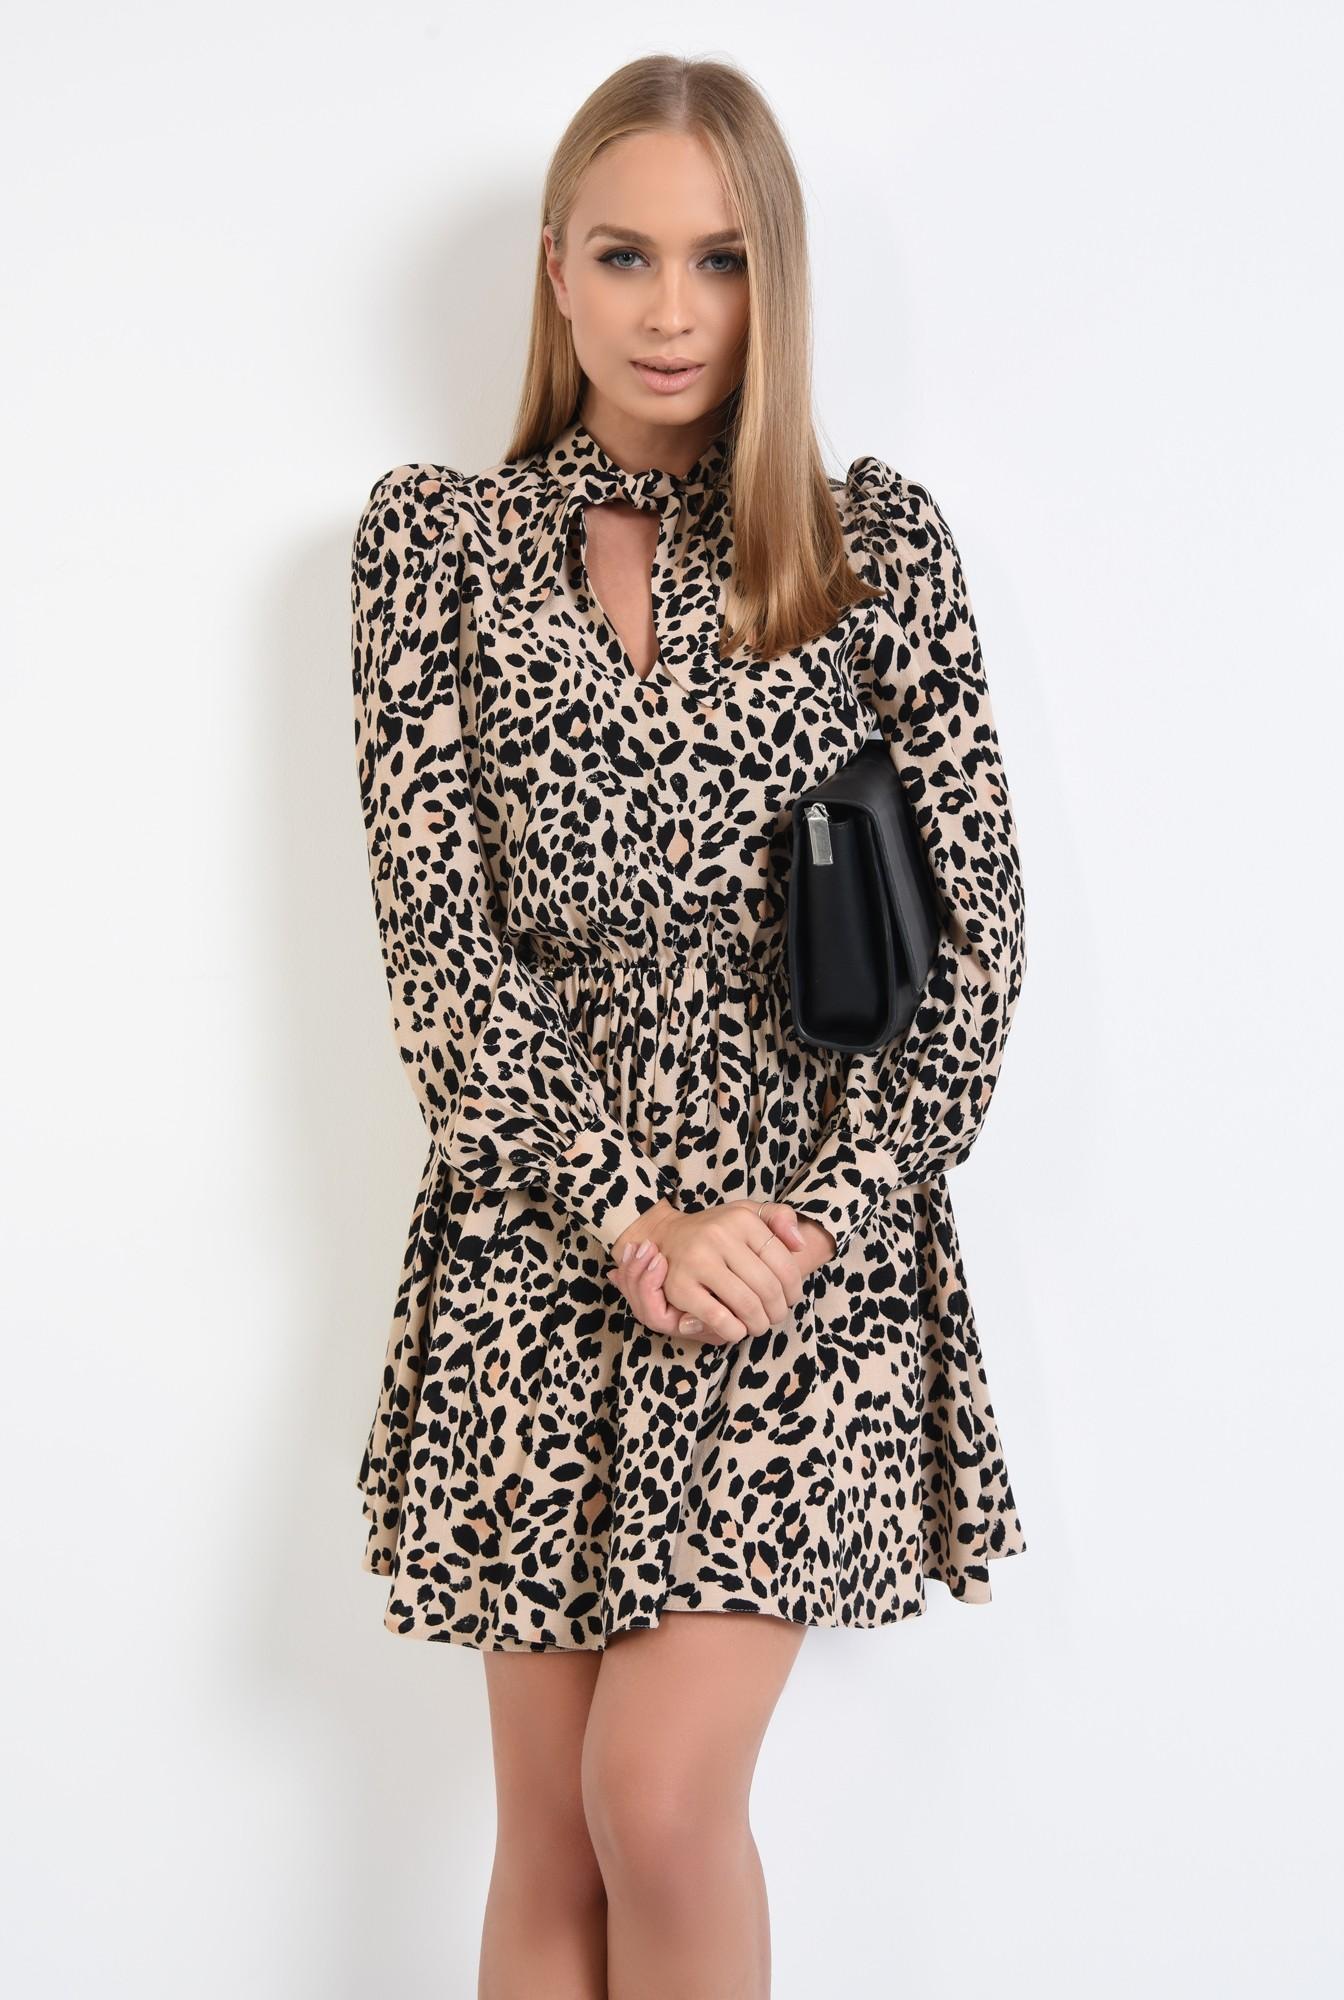 0 - 360 - rochie casual, scurta, clos, animal print, funda